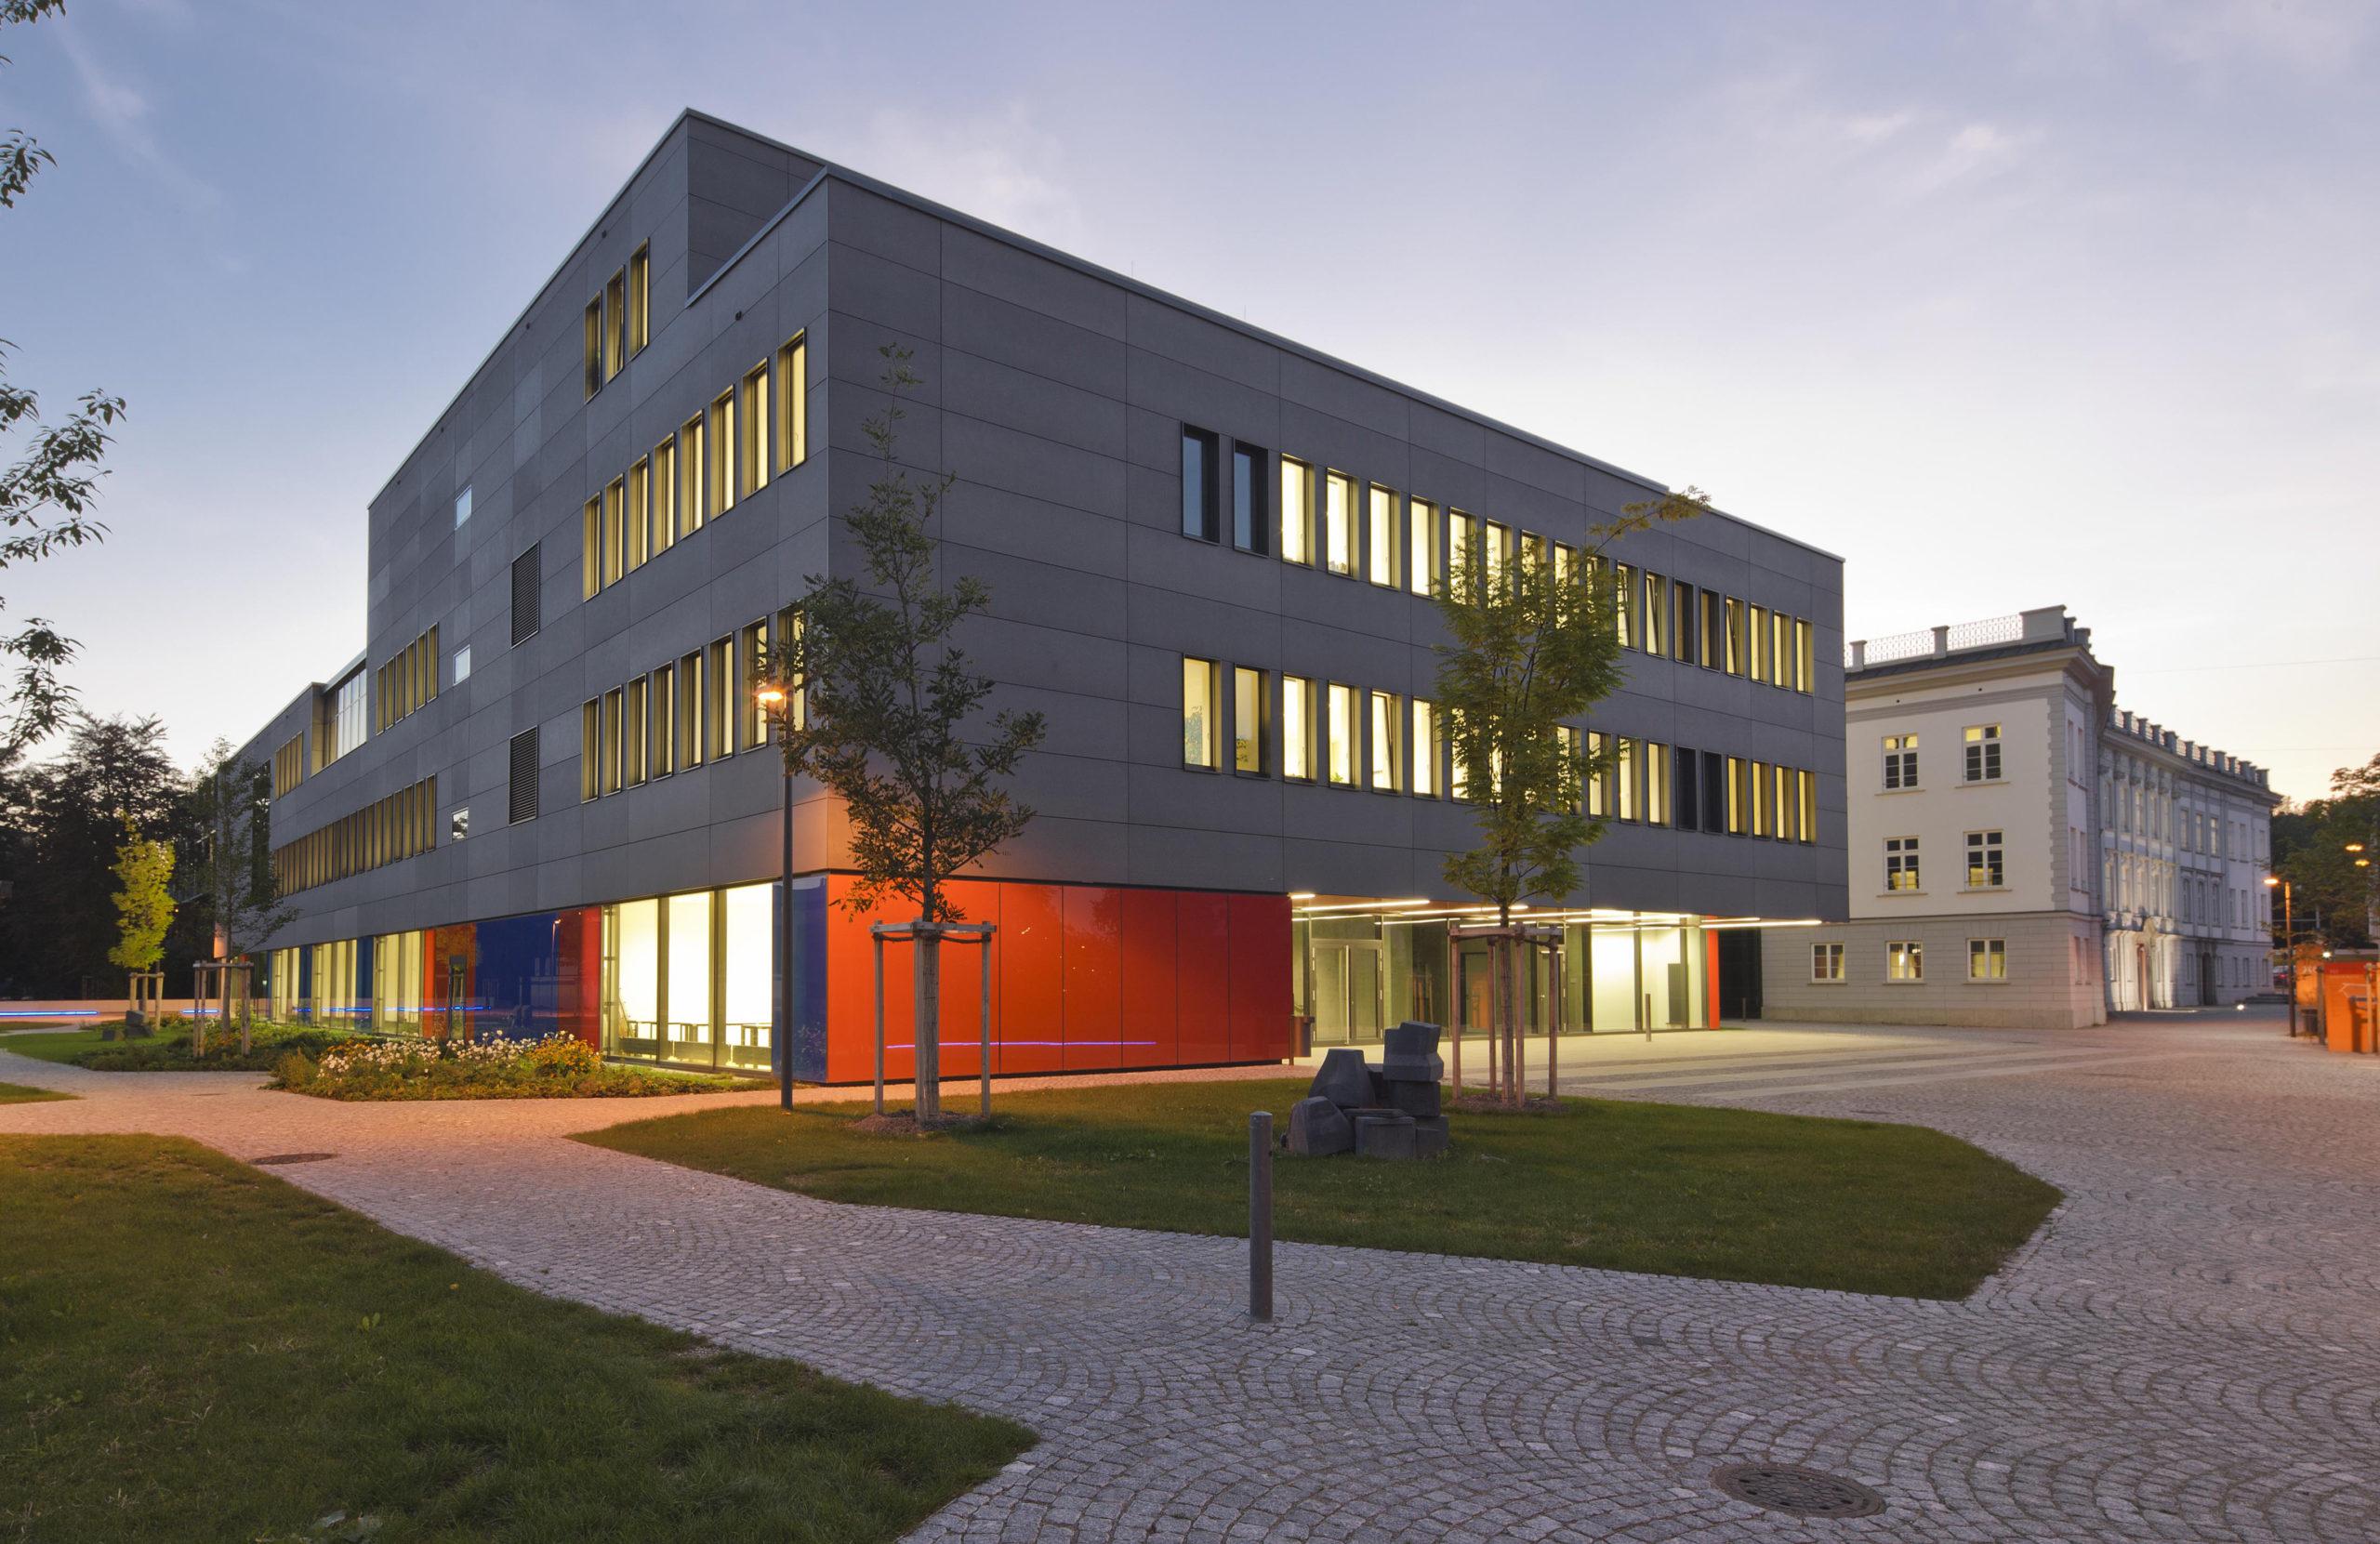 HSA Campus am Roten Tor